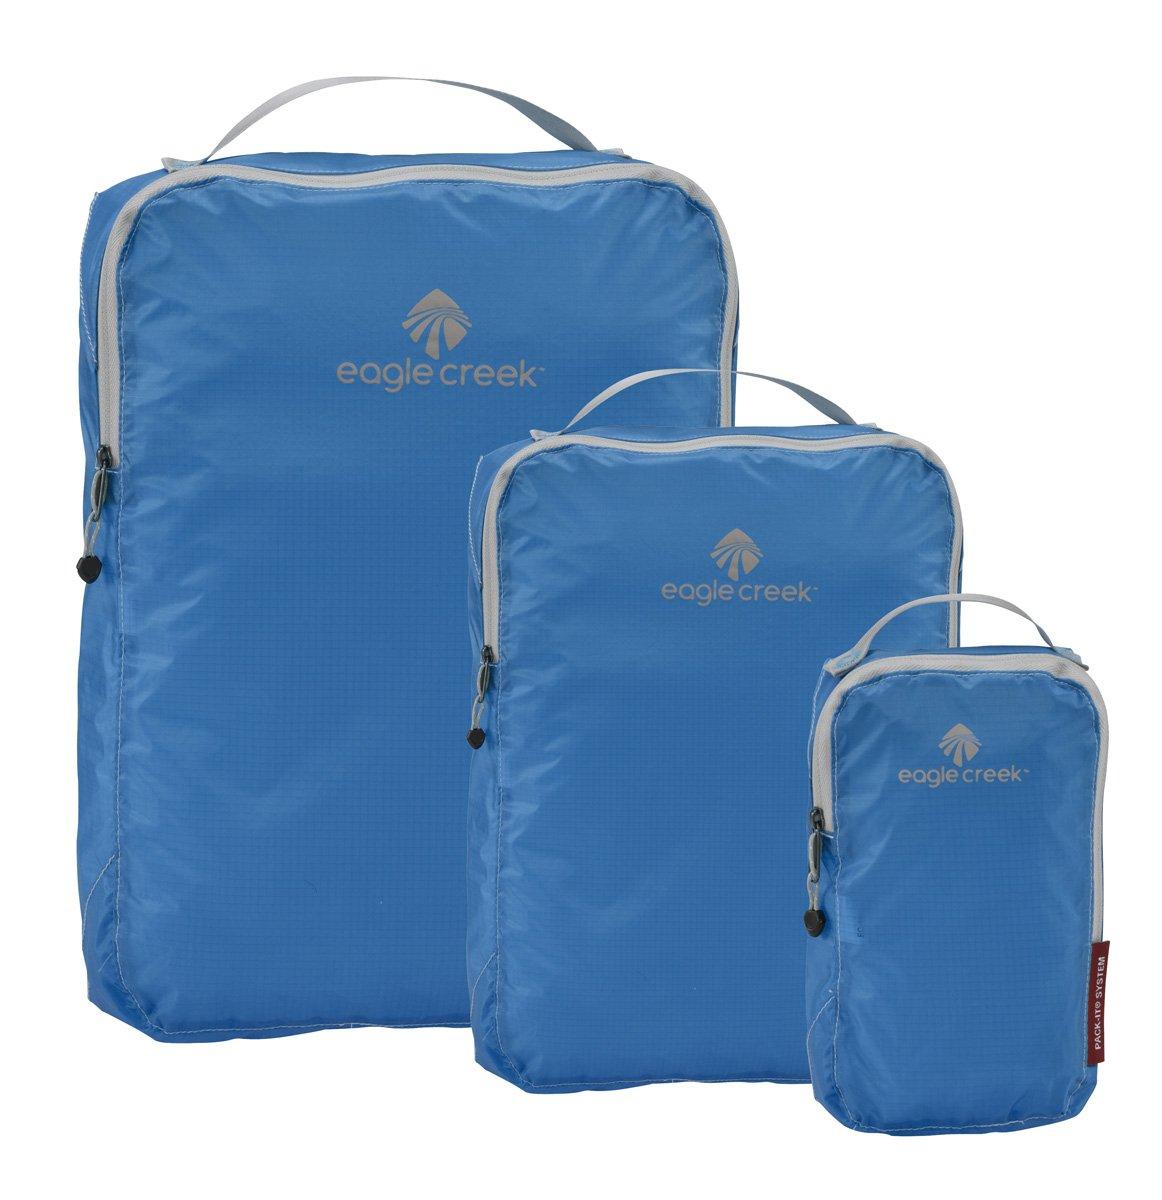 Eagle Creek Travel Gear Pack-it Specter Cube Set, Brilliant Blue by Eagle Creek